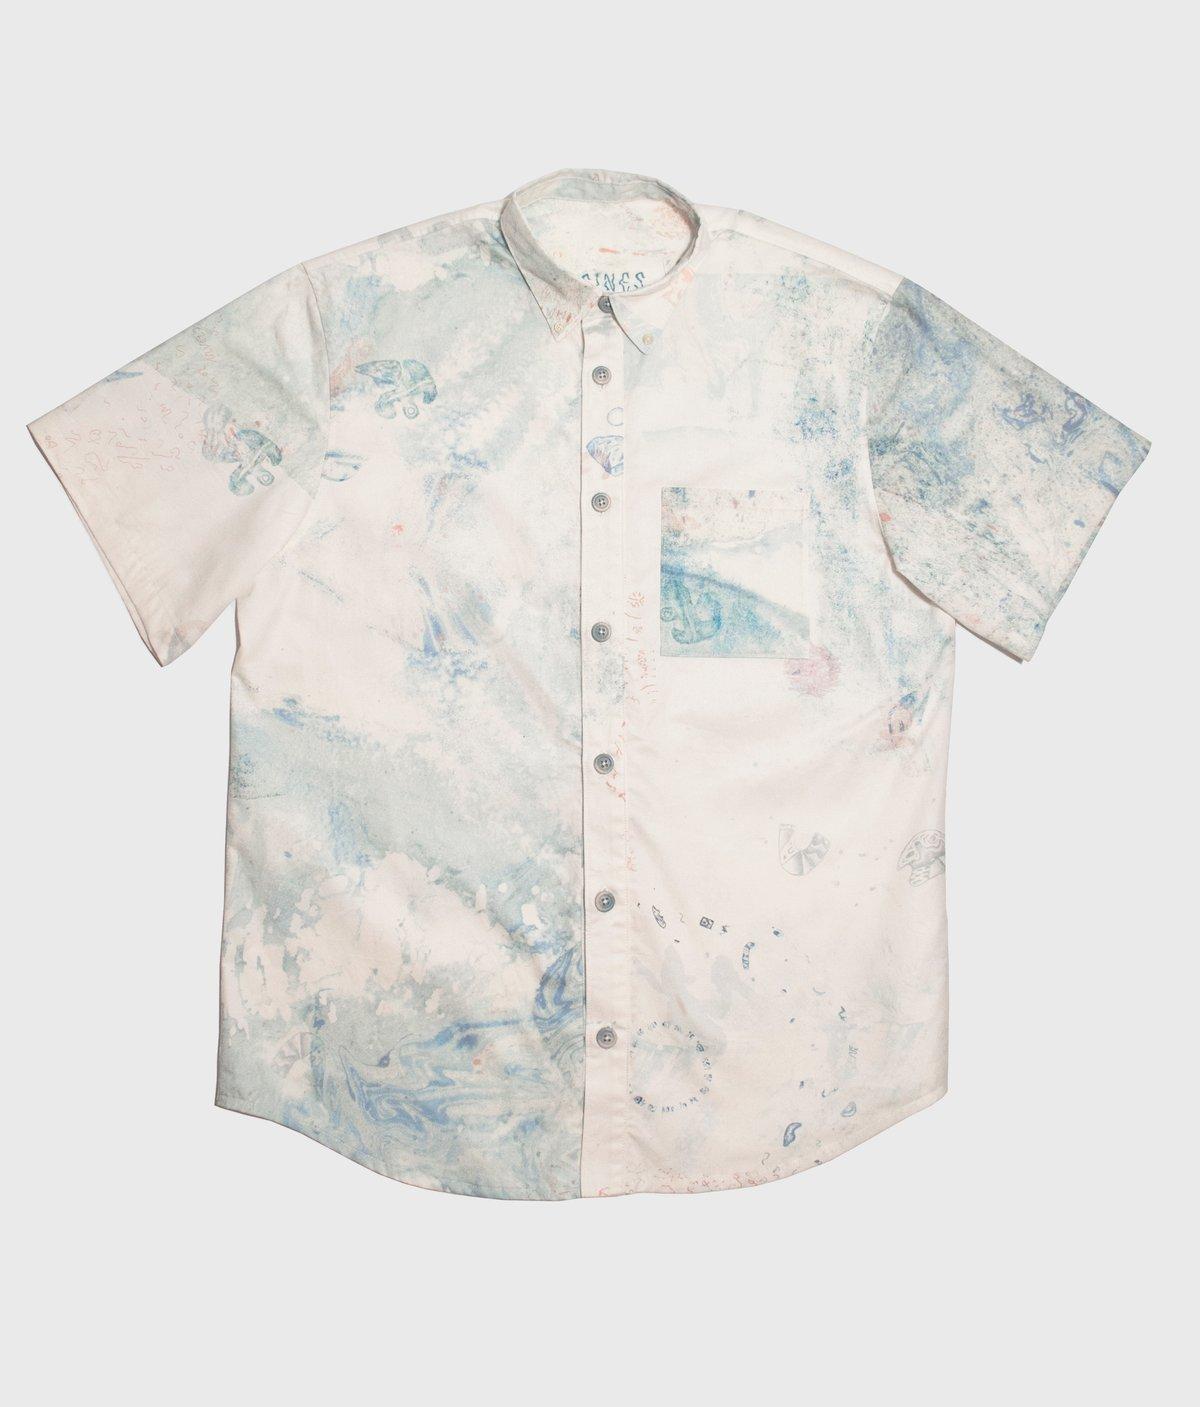 Image of Sines Shirt: 4